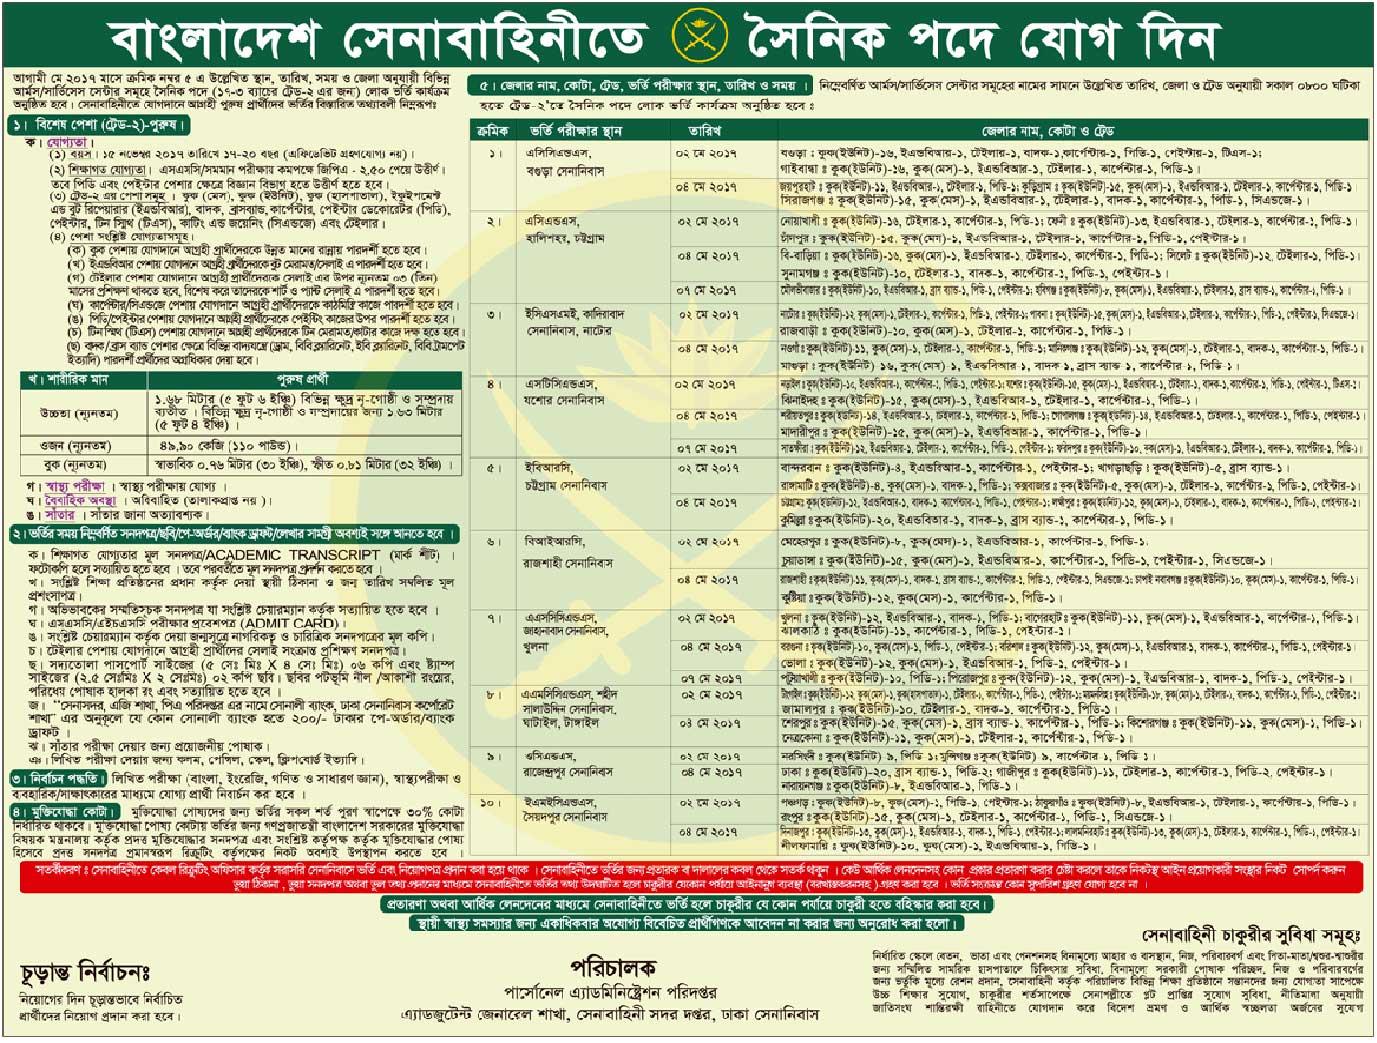 Bangladesh Army jobs Circular 2017